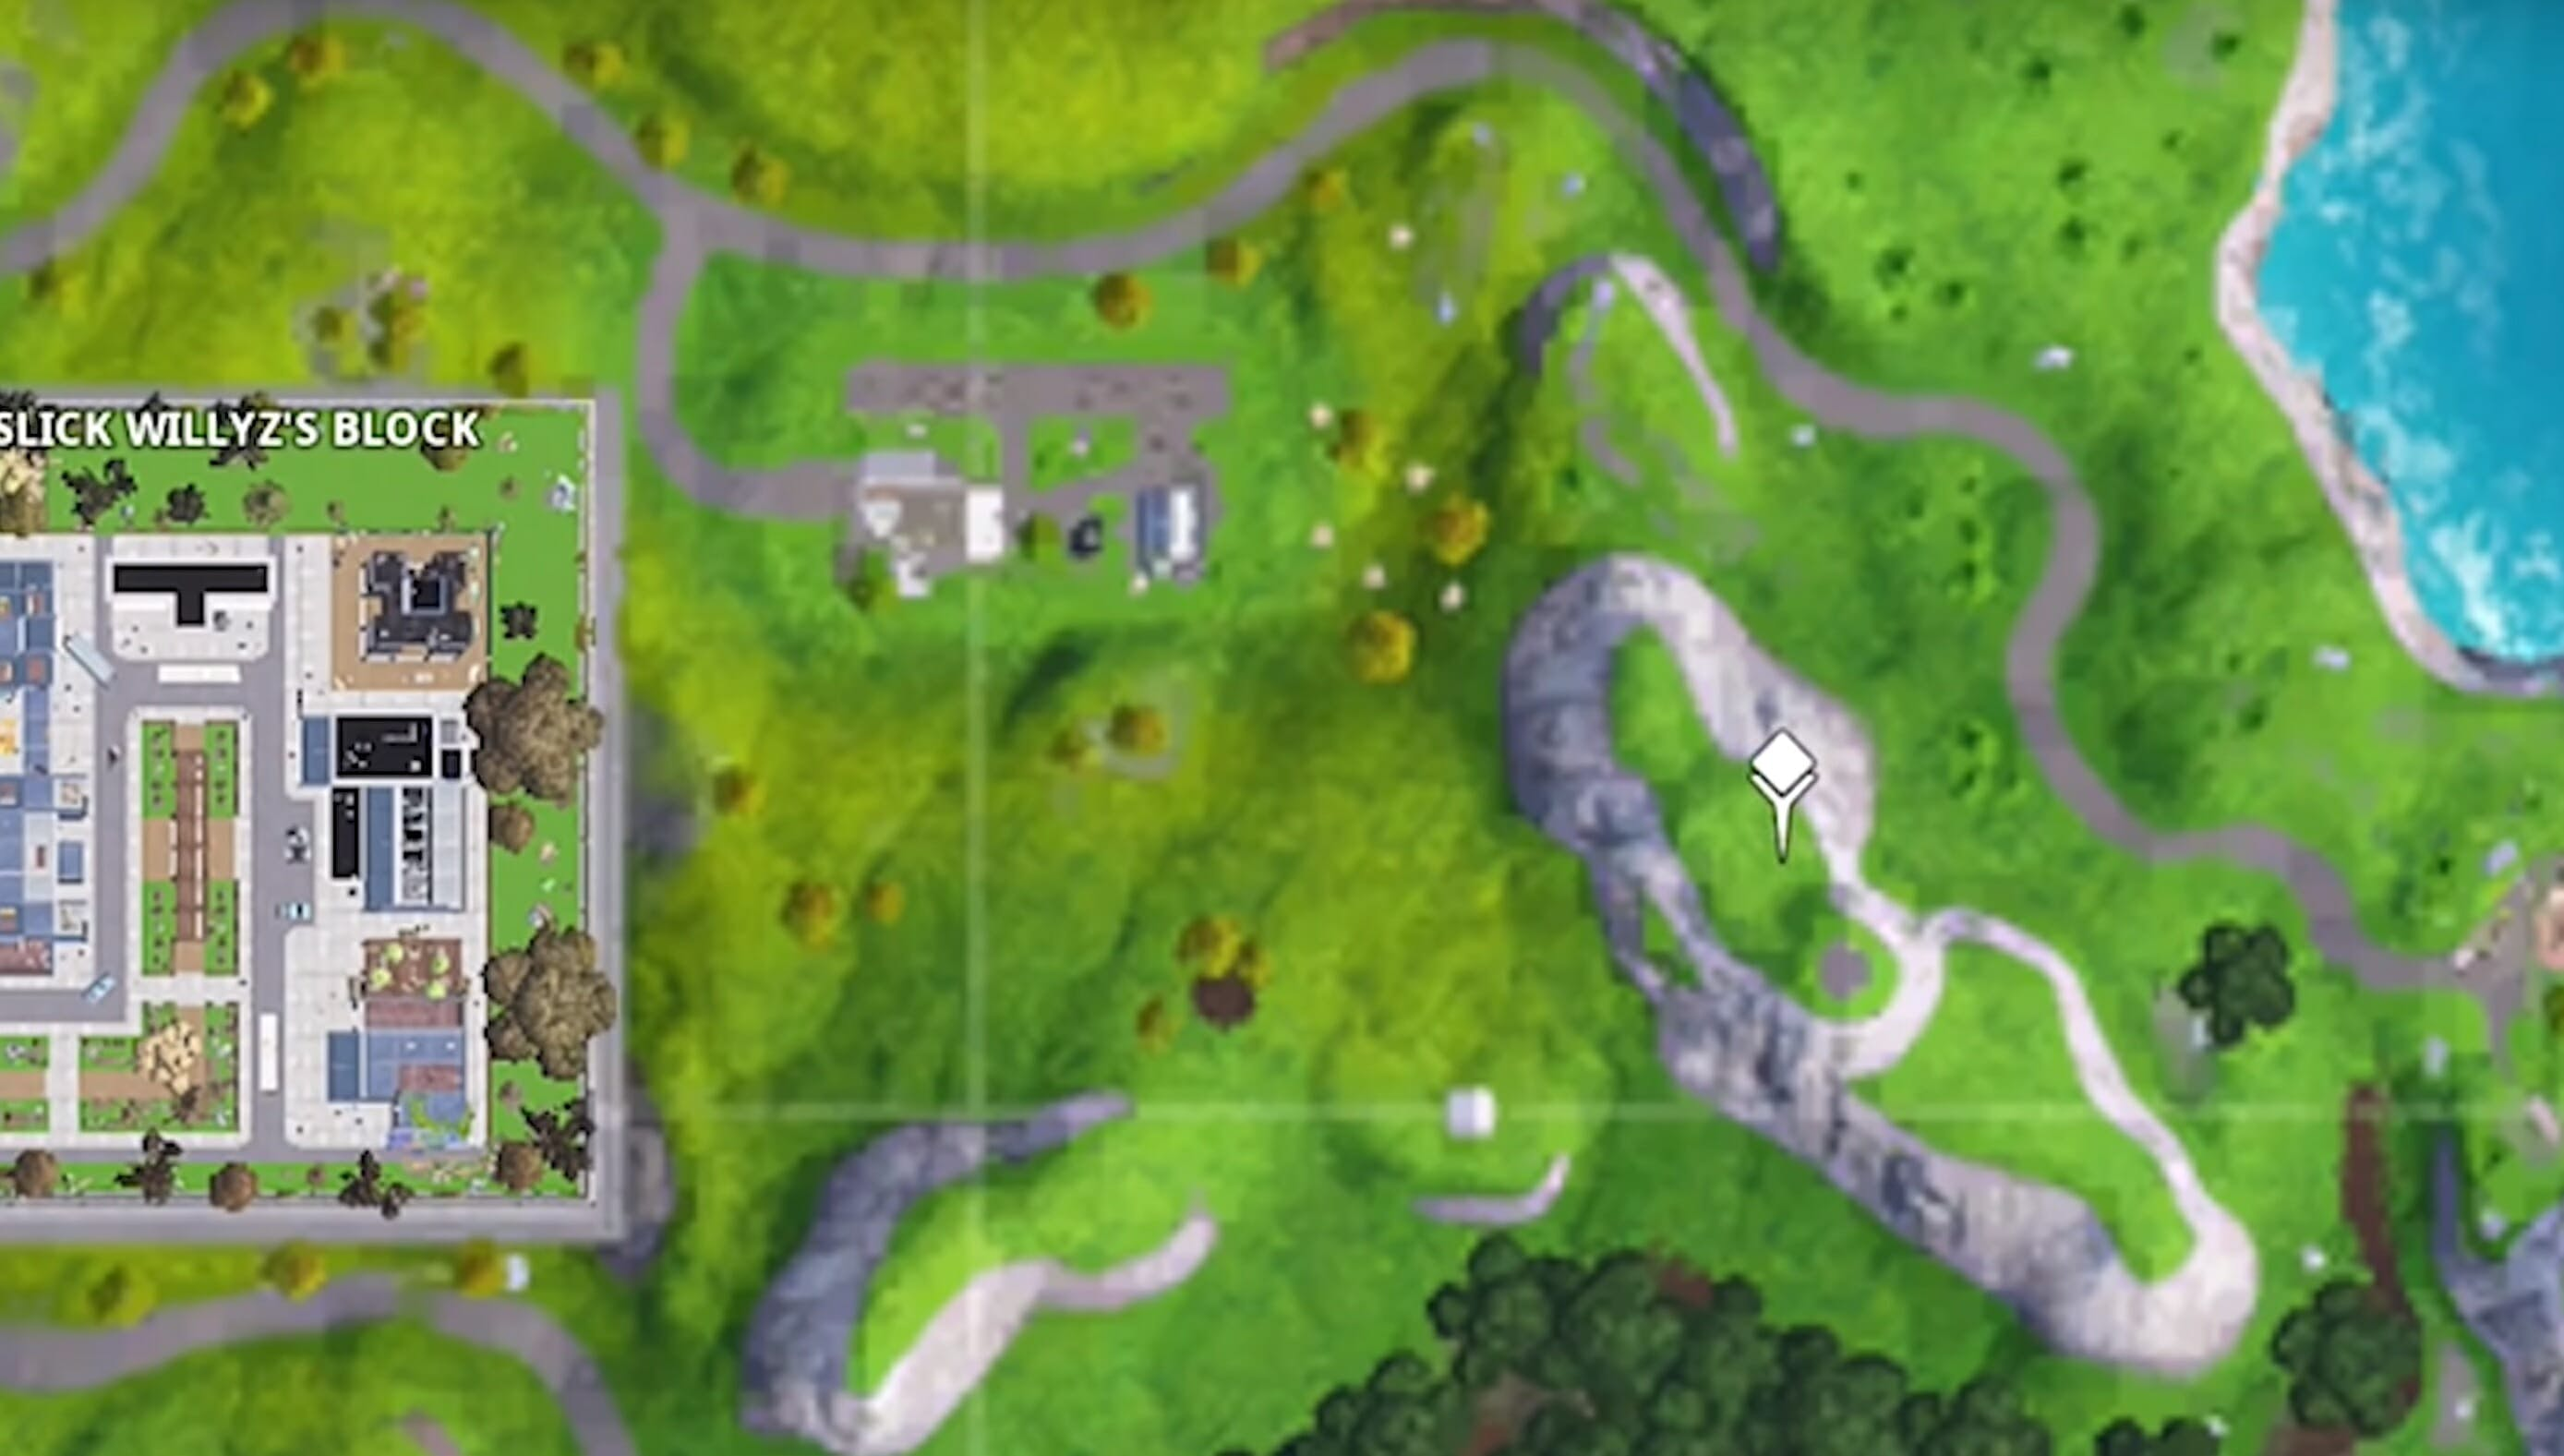 fortnite prisoner skin stage 4 map